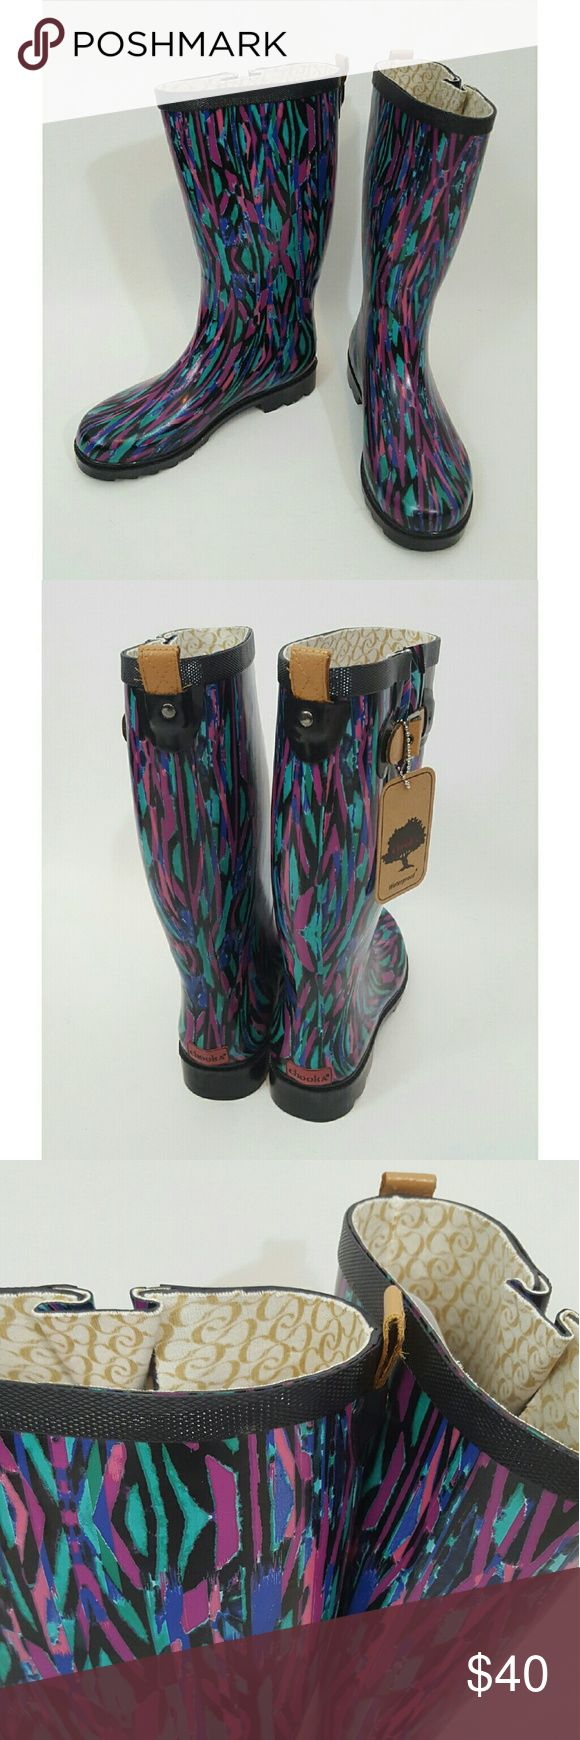 Chooka pattern rubber rain boots NEW size 8 NEW with tags Chooka brand rubber rain boots.  Size 8 women. chooka Shoes Winter & Rain Boots